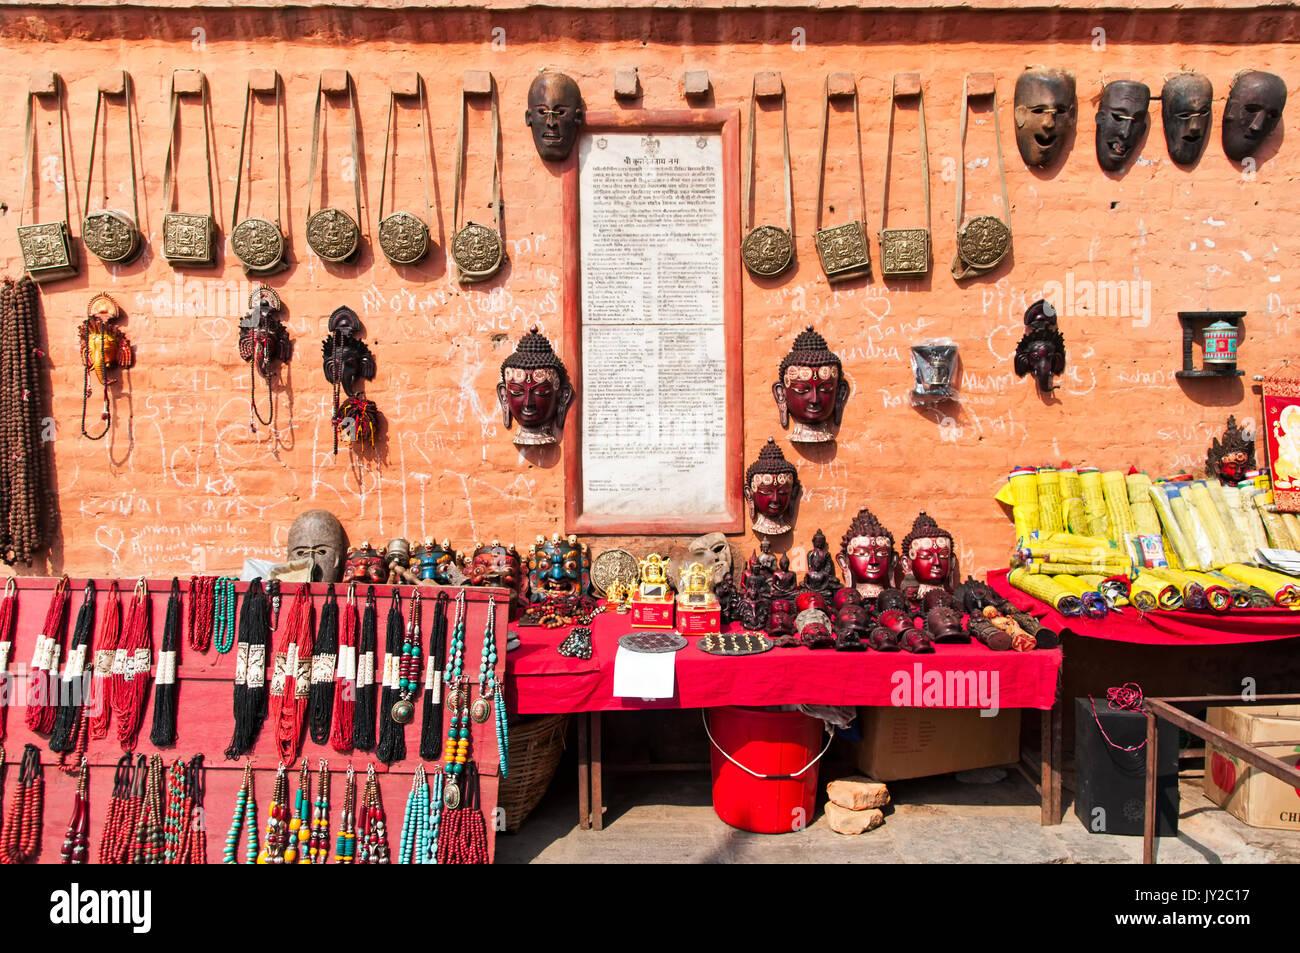 nepalese souvenirs kathmandu nepal stockfotos nepalese souvenirs kathmandu nepal bilder alamy. Black Bedroom Furniture Sets. Home Design Ideas